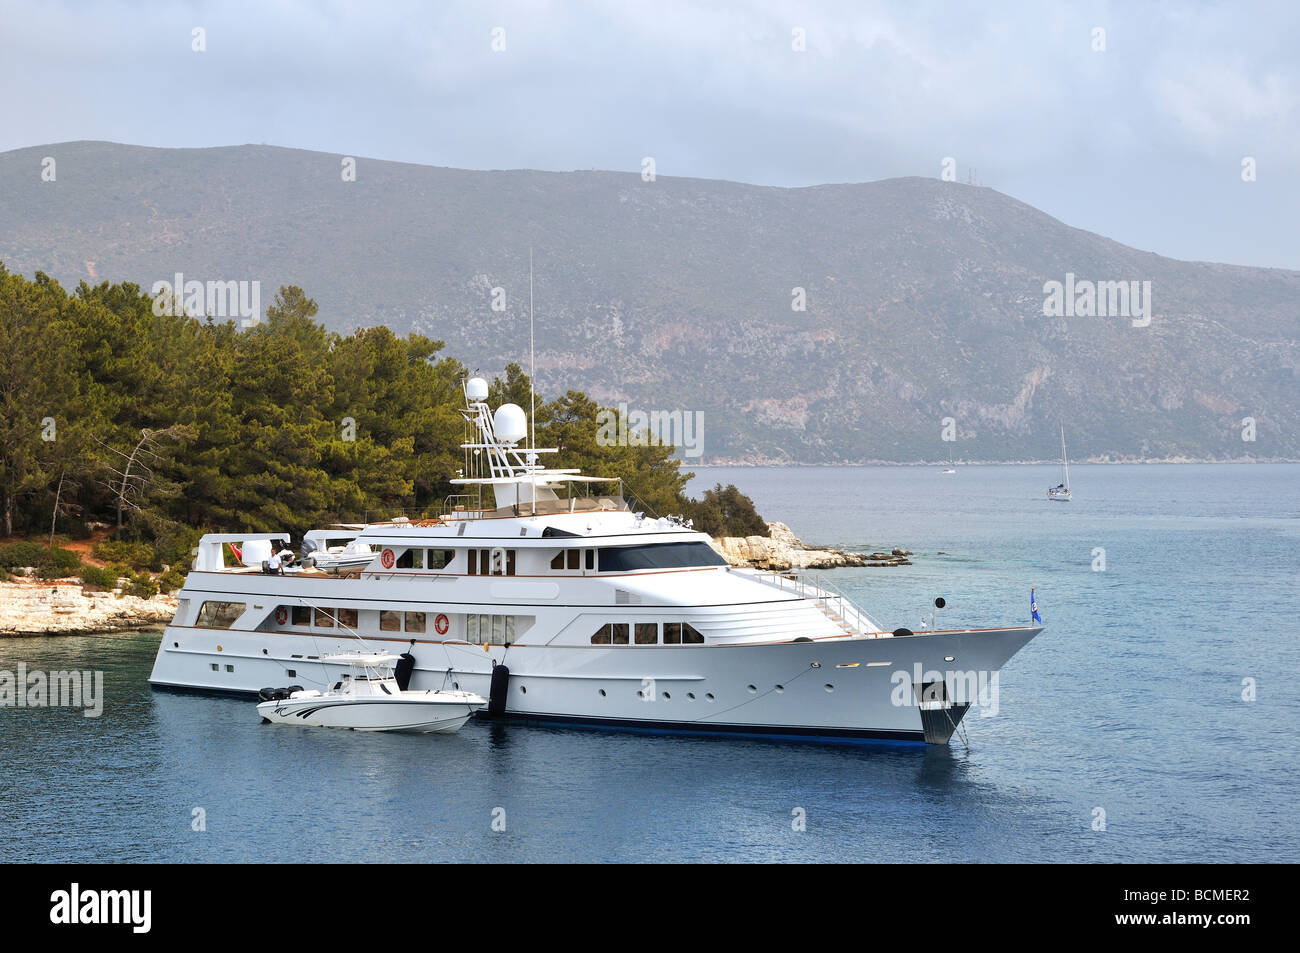 Luxury yacht in the Greek sea - Stock Image